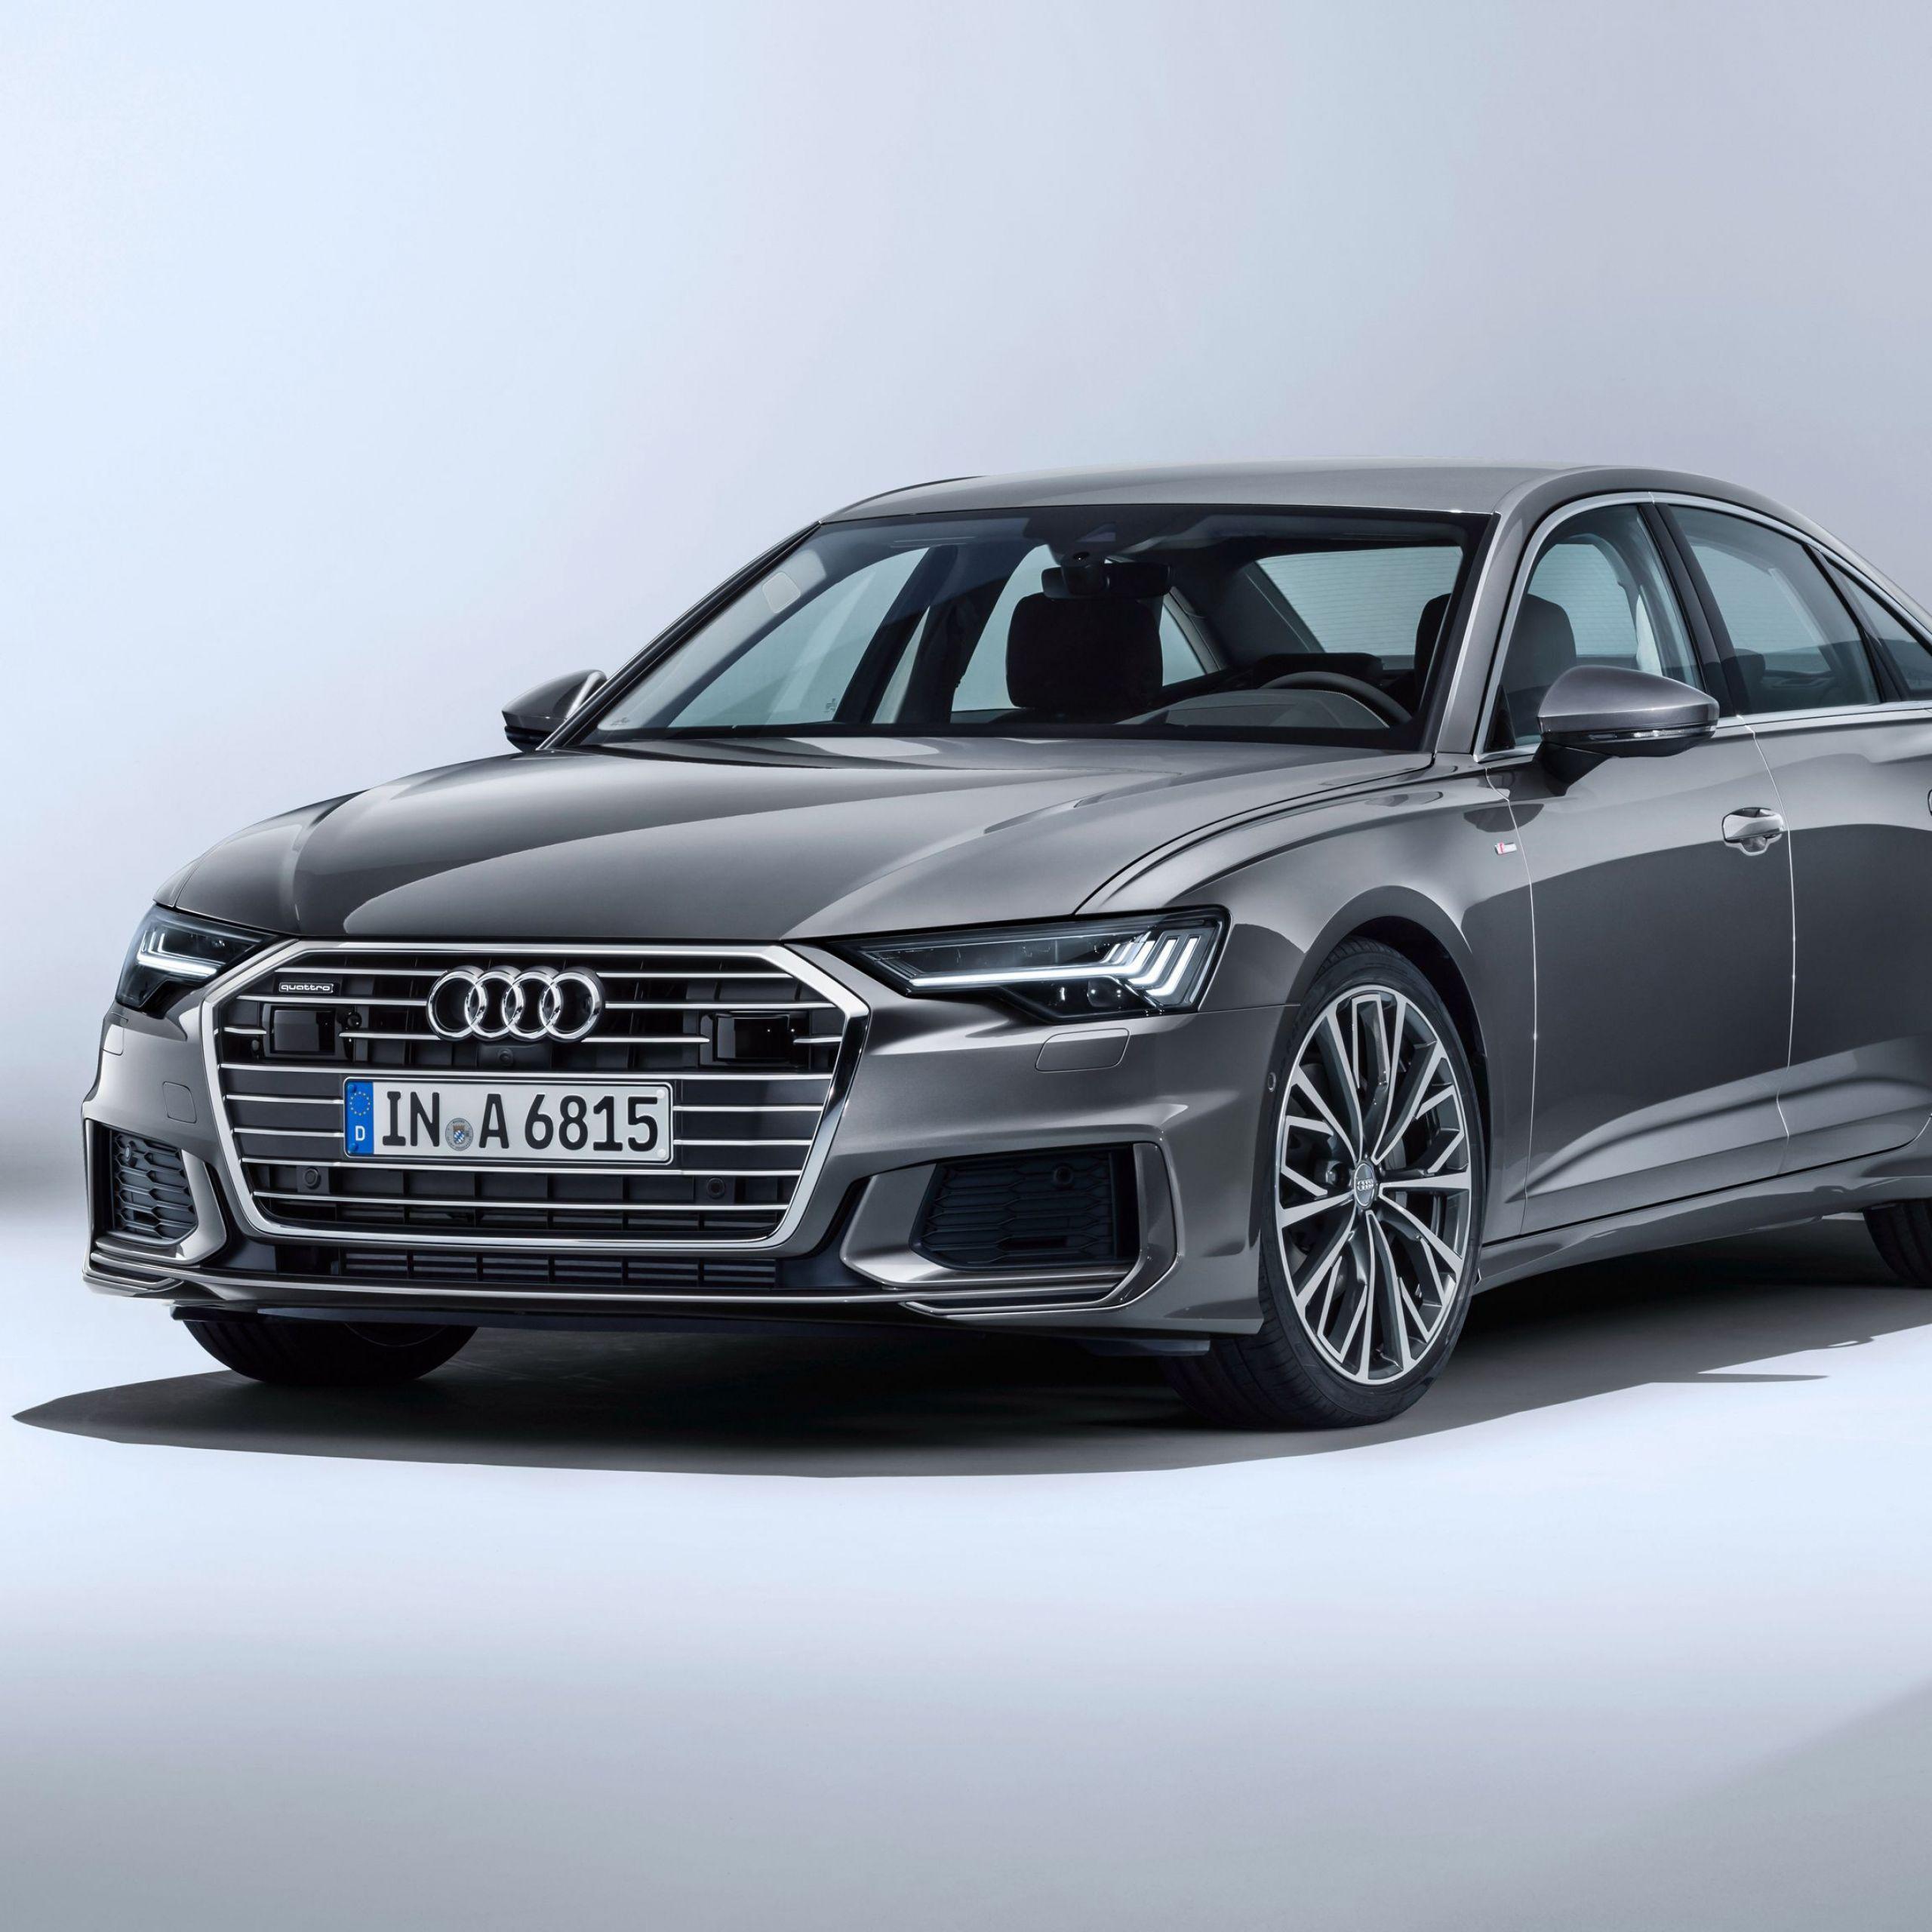 Audi S6 For Sale Elegant Audi A6 50 Tdi Quattro S Line 2018 4k Audi S6 Audi Audi A6